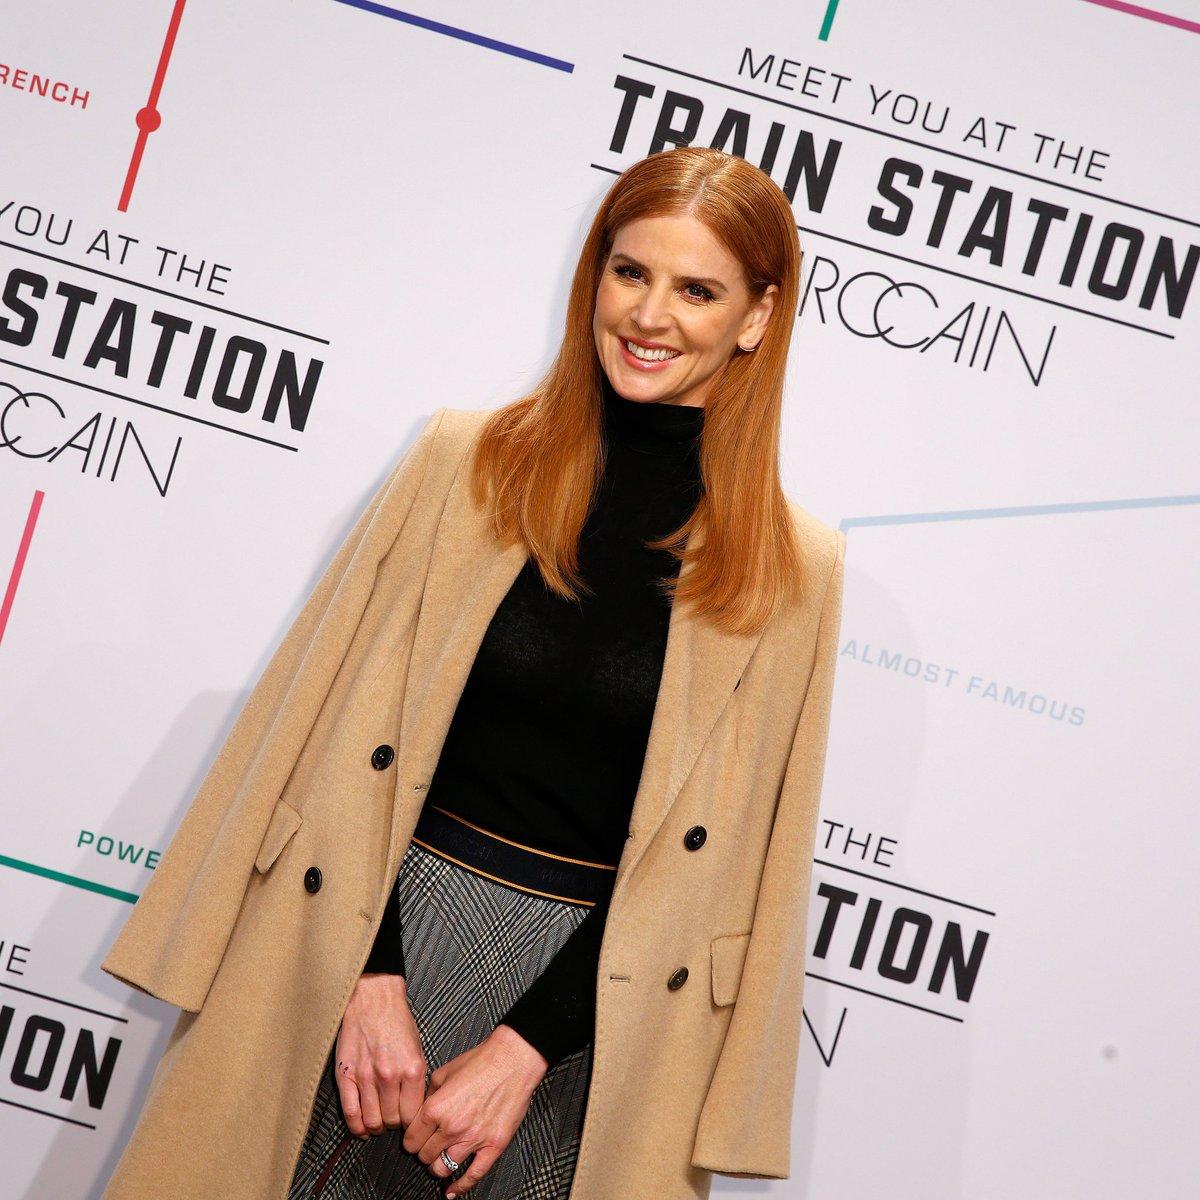 Sarah Rafferty na Semana de Moda de Berlim de 2019. . Sarah Rafferty attends the 2019 Berlin Fashion Week.  #SarahRafferty #DonnaPaulsen #Suits #SuitsUSA #BerlinFashionWeek #Berlim #Berlin #FashionWeek #SemanadeModapic.twitter.com/FrKolENFtQ